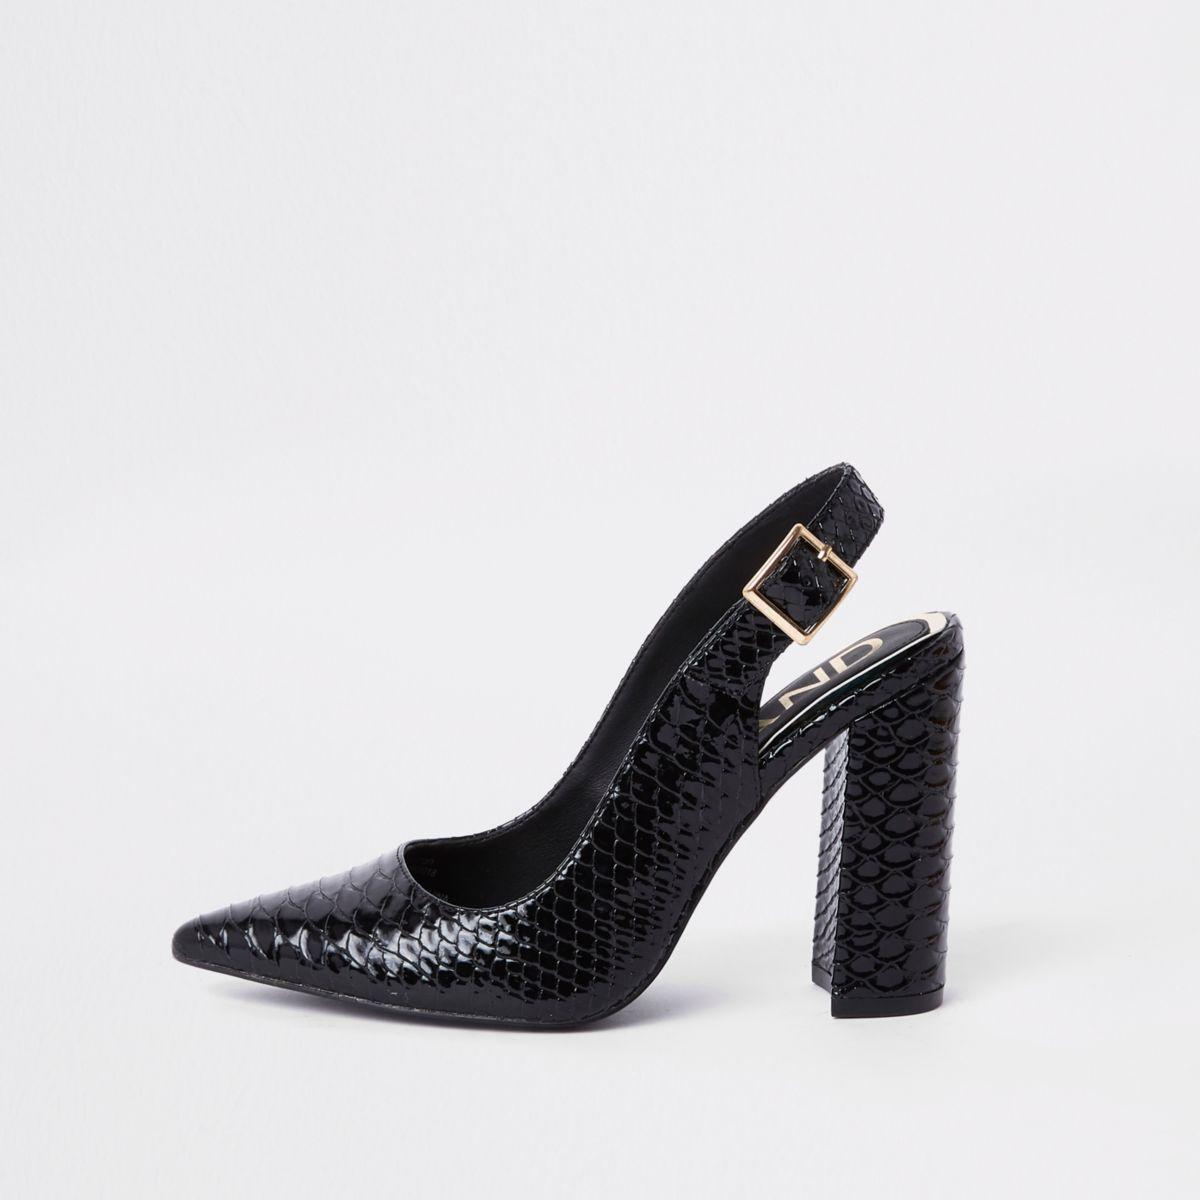 Black croc block heel sling back pumps